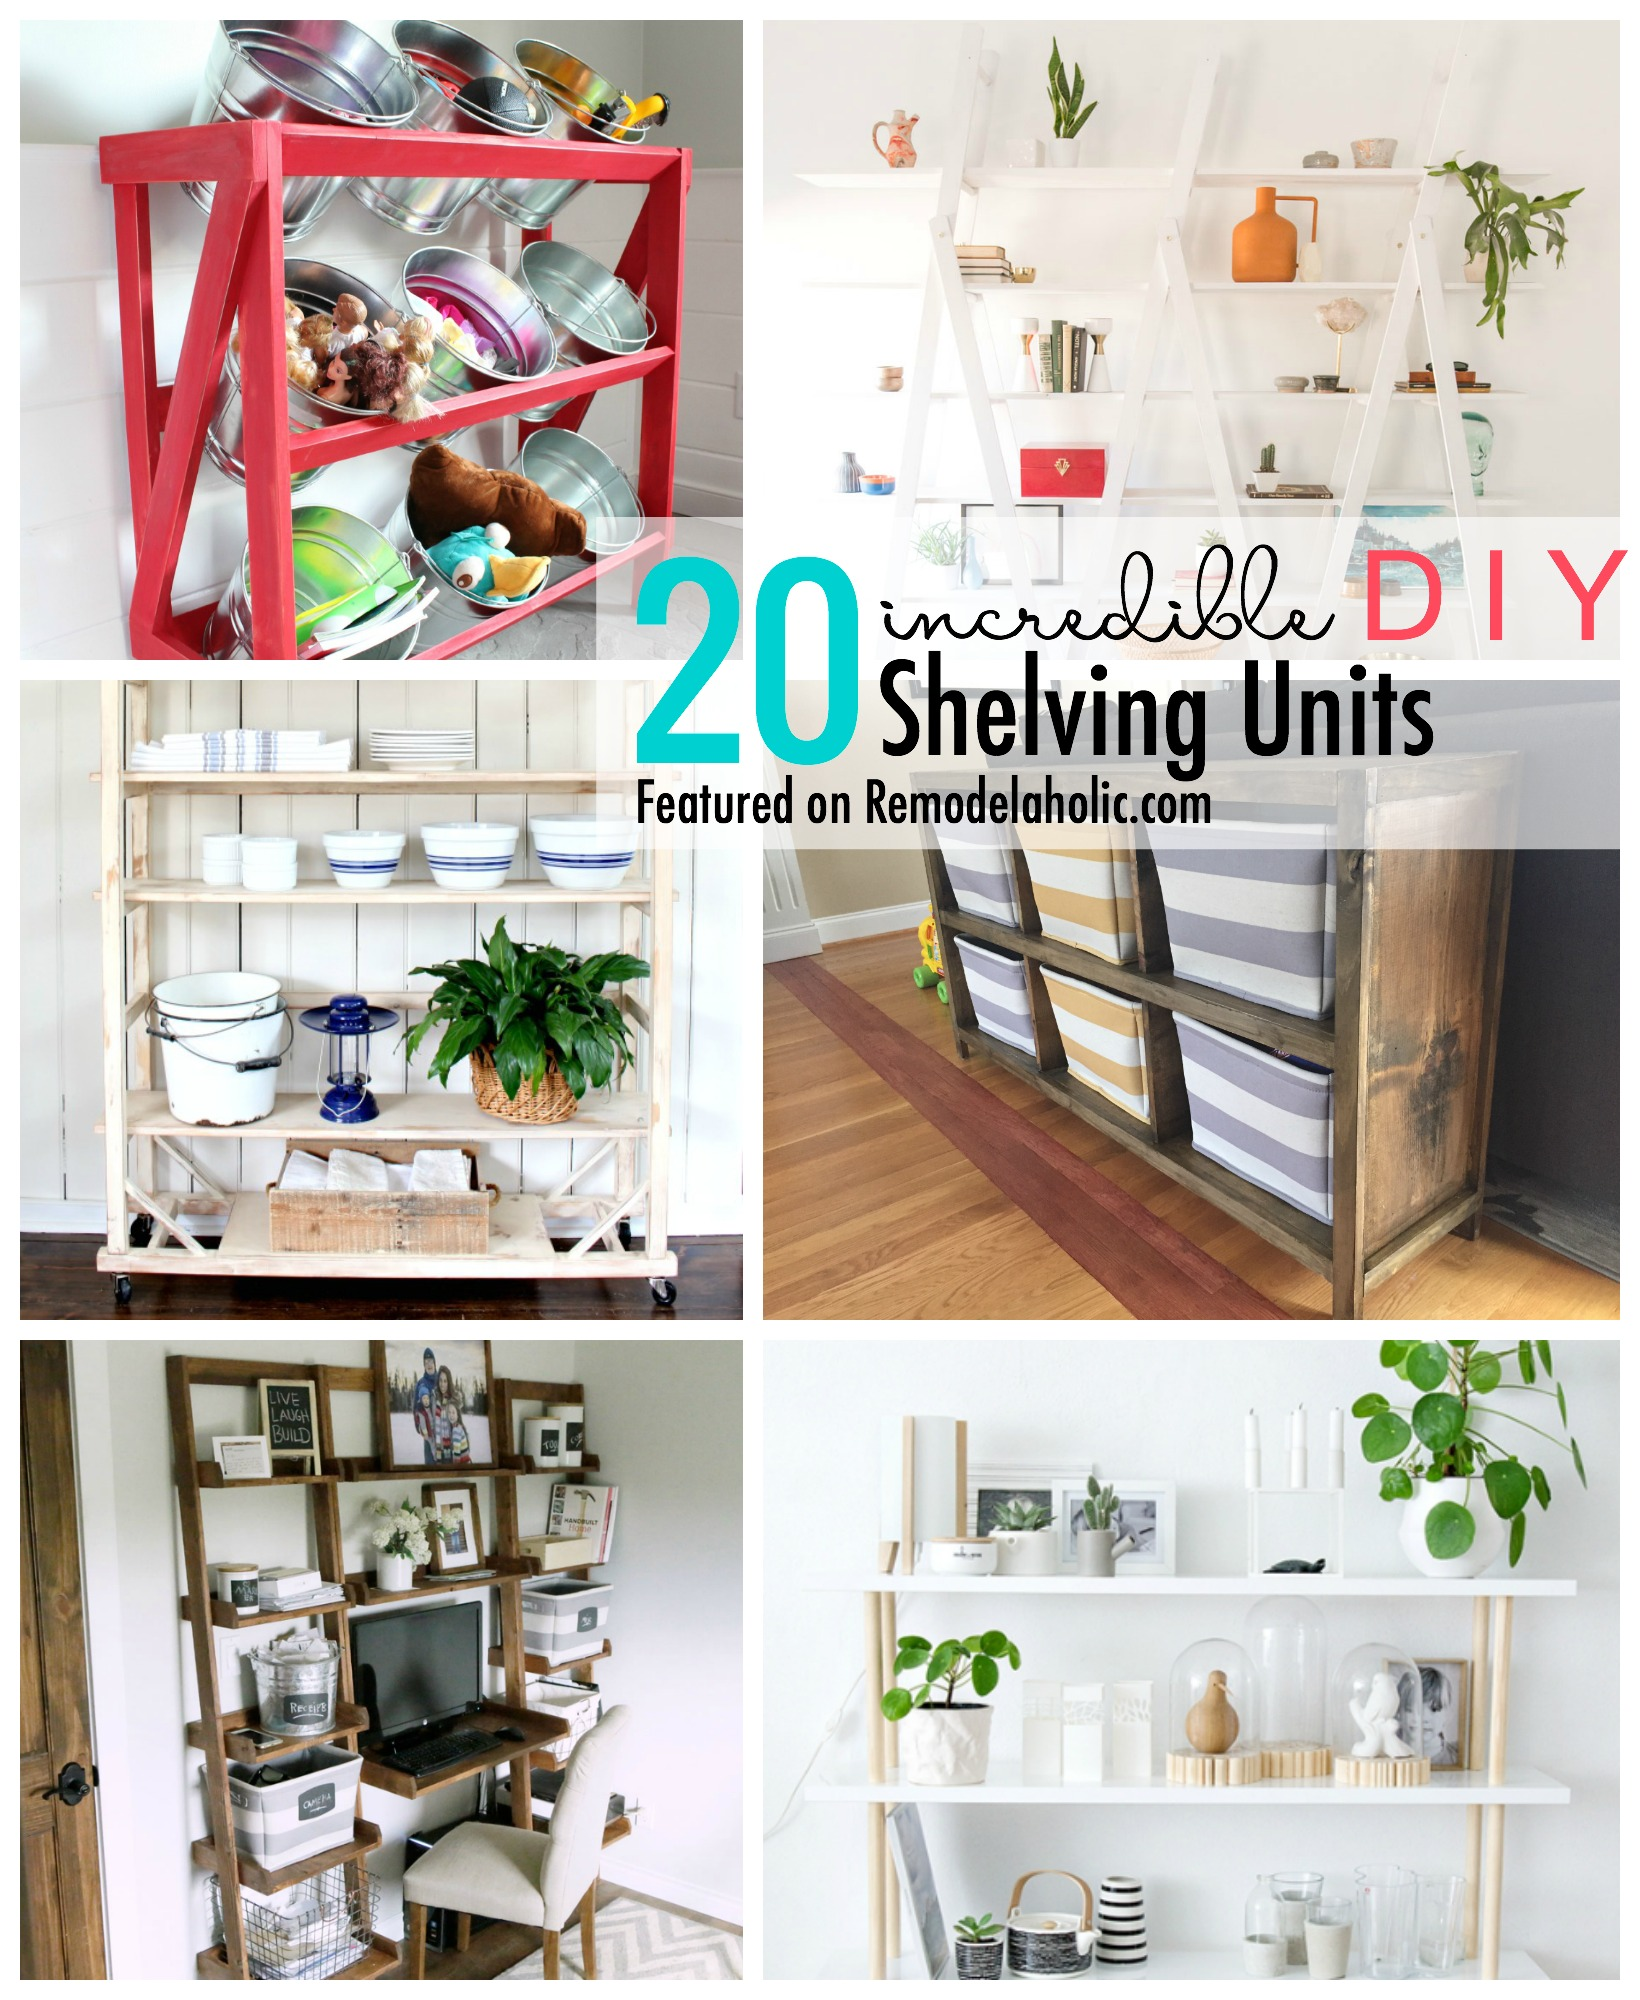 Remodelaholic 20 Incredible Diy Shelving Units